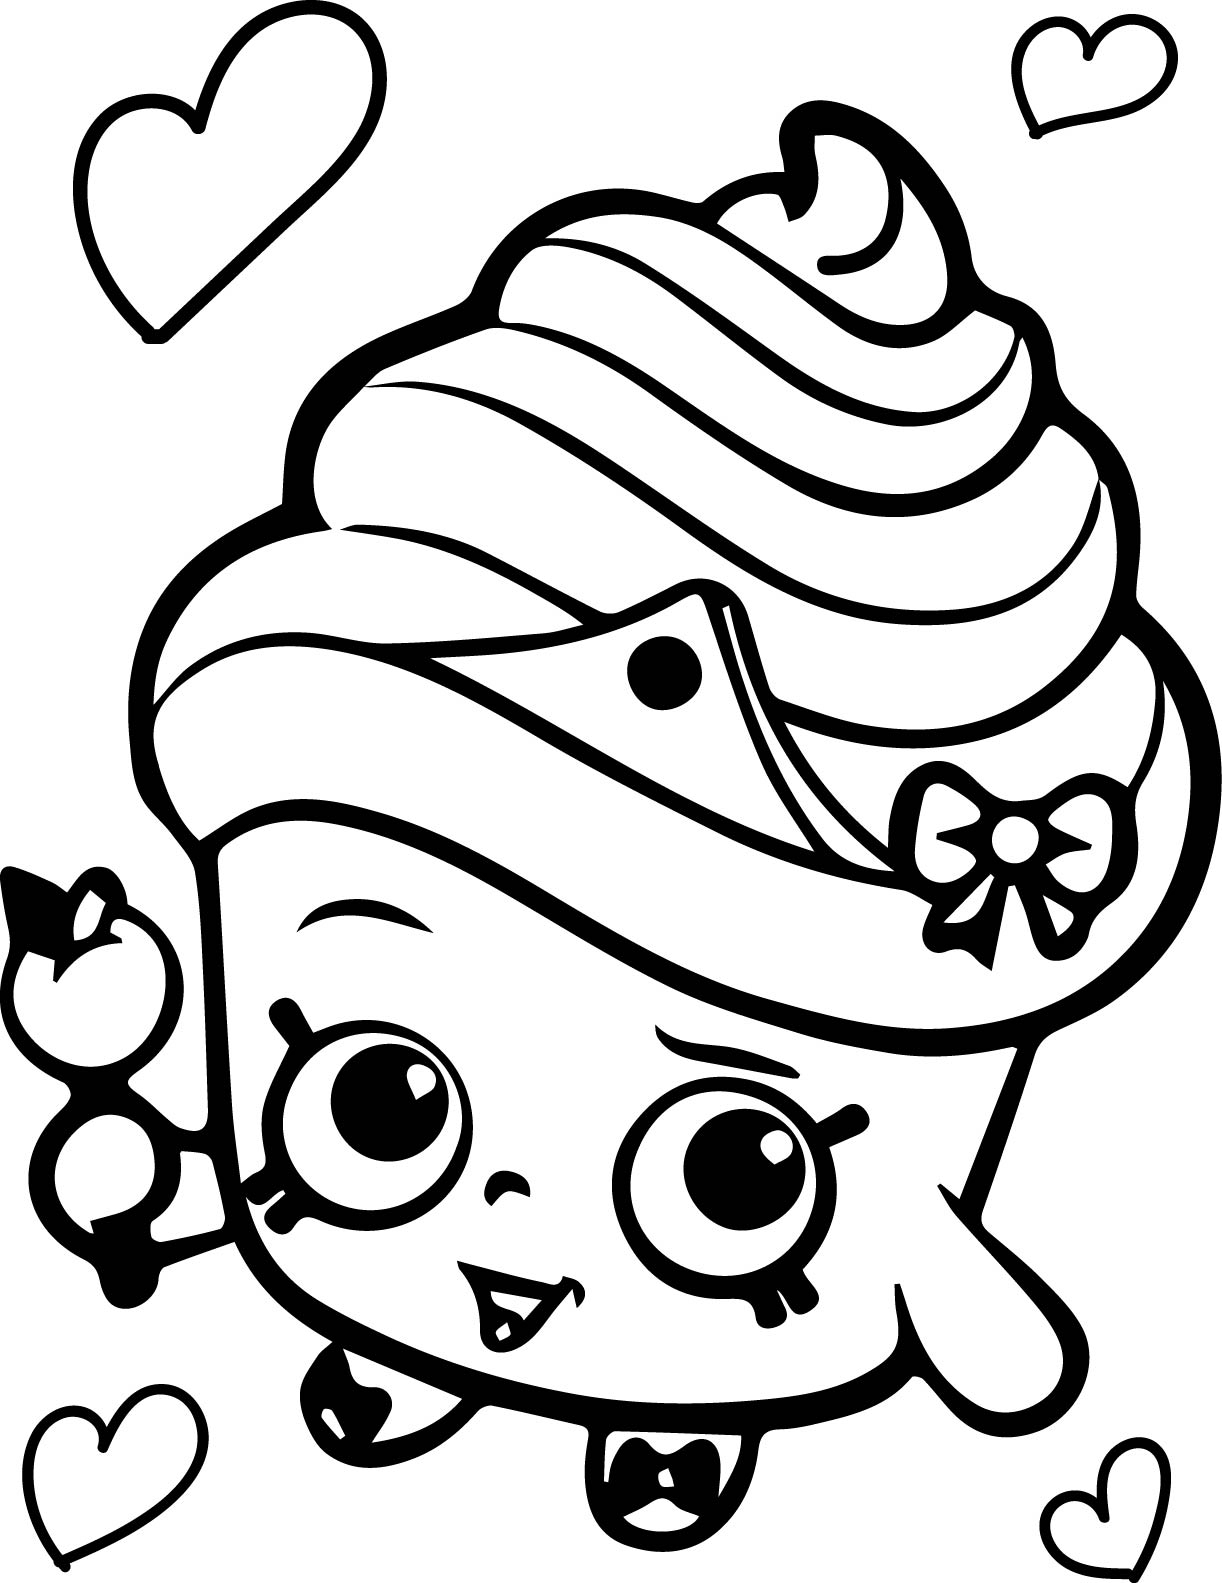 1222x1583 Shopkins Pizza Coloring Page Printable